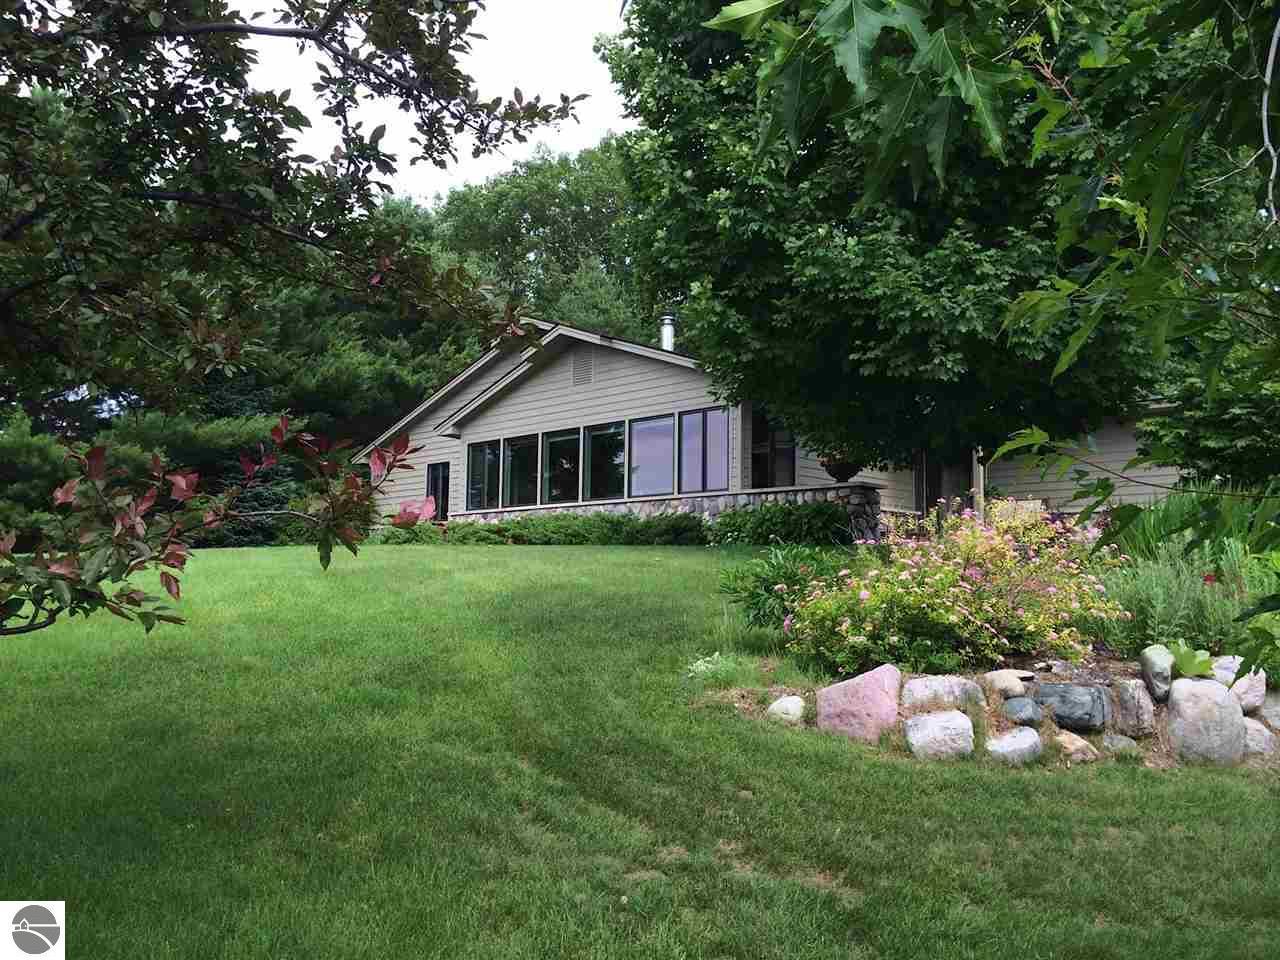 Property for sale at 128 S Highland Drive, Leland,  MI 49653